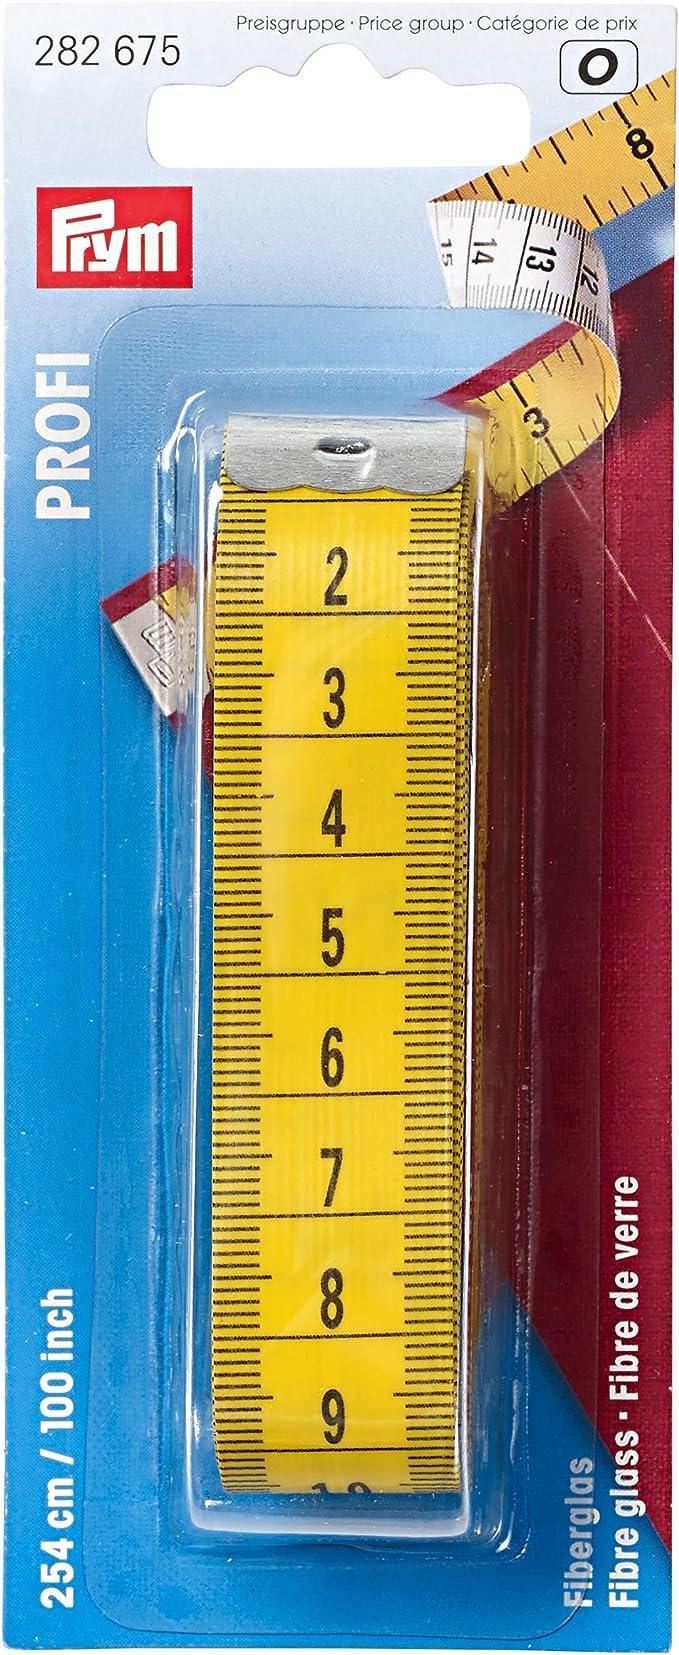 "Prym Professional Fibreglass Tape Measure 254cm//100/"" Tailors Dressmaking 282675"